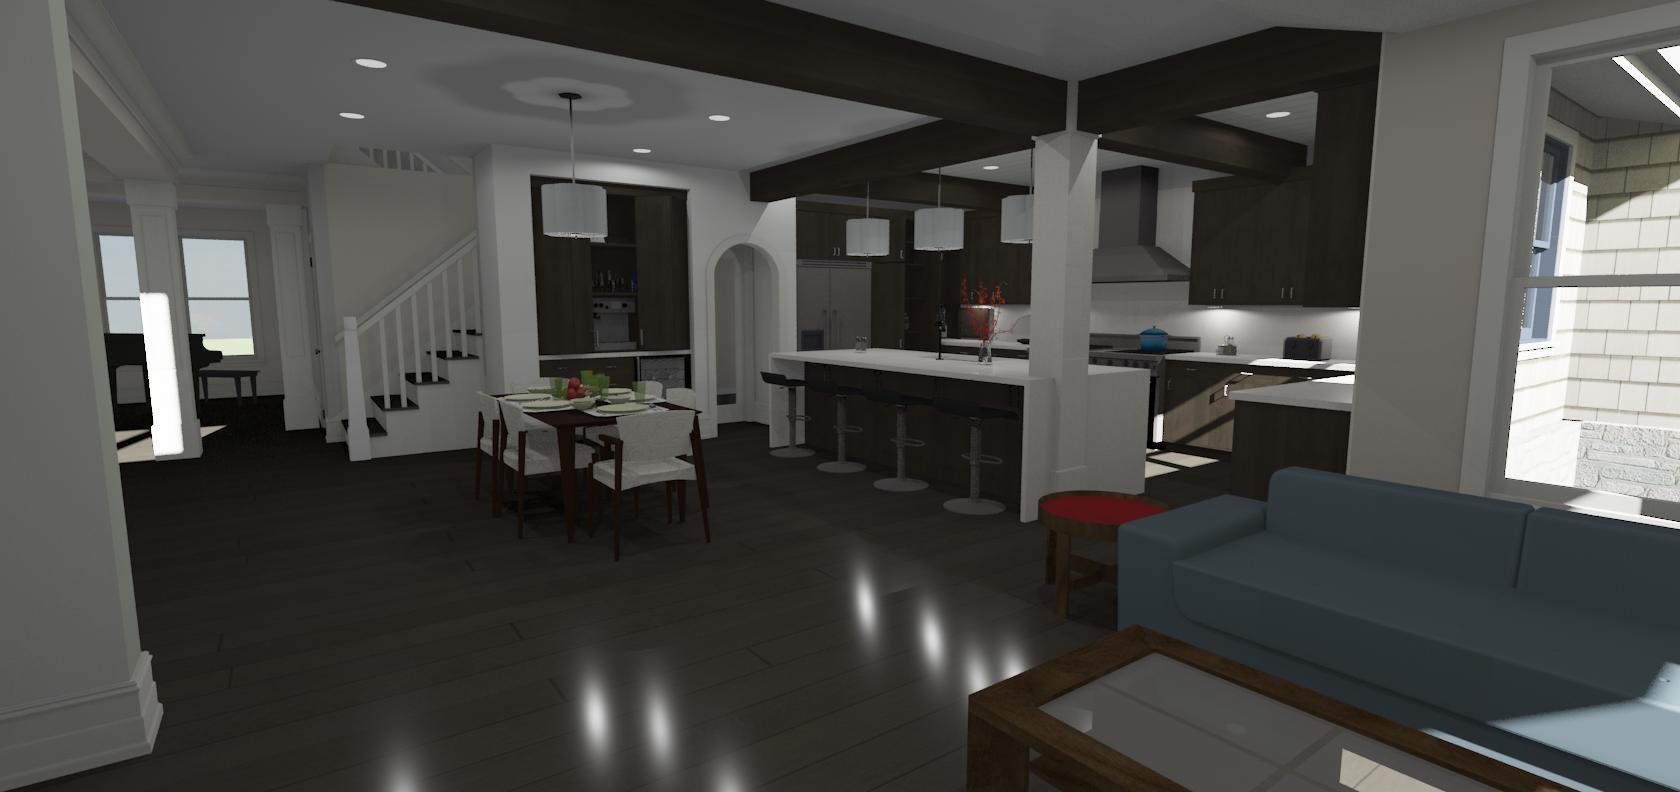 Michael-Buss-Architects 18025-Sun-Room